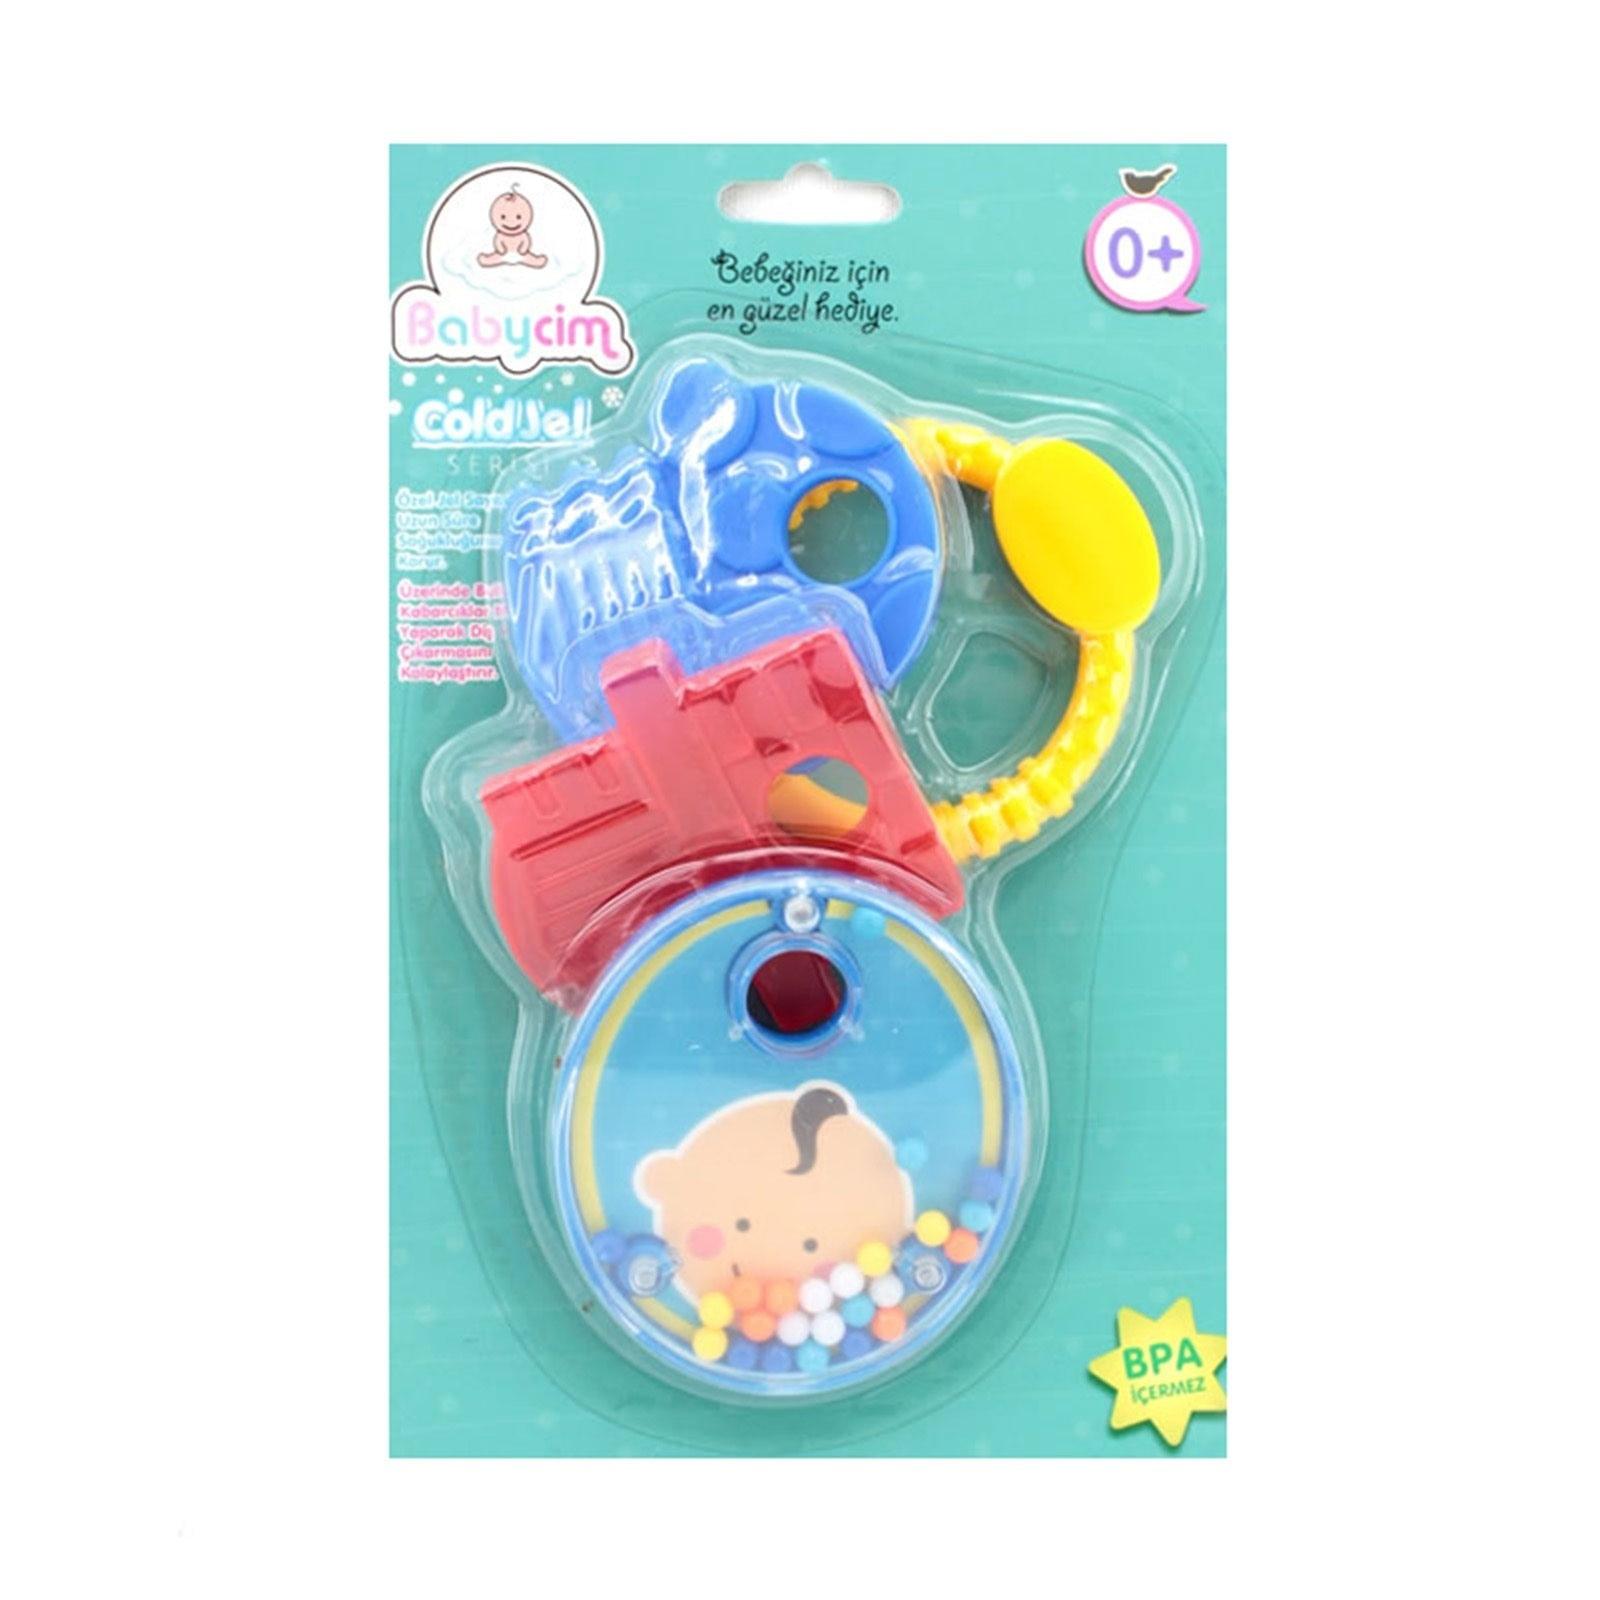 Ebebek Birlik Oyuncak Printed Gel Baby Teether Set With Rattle